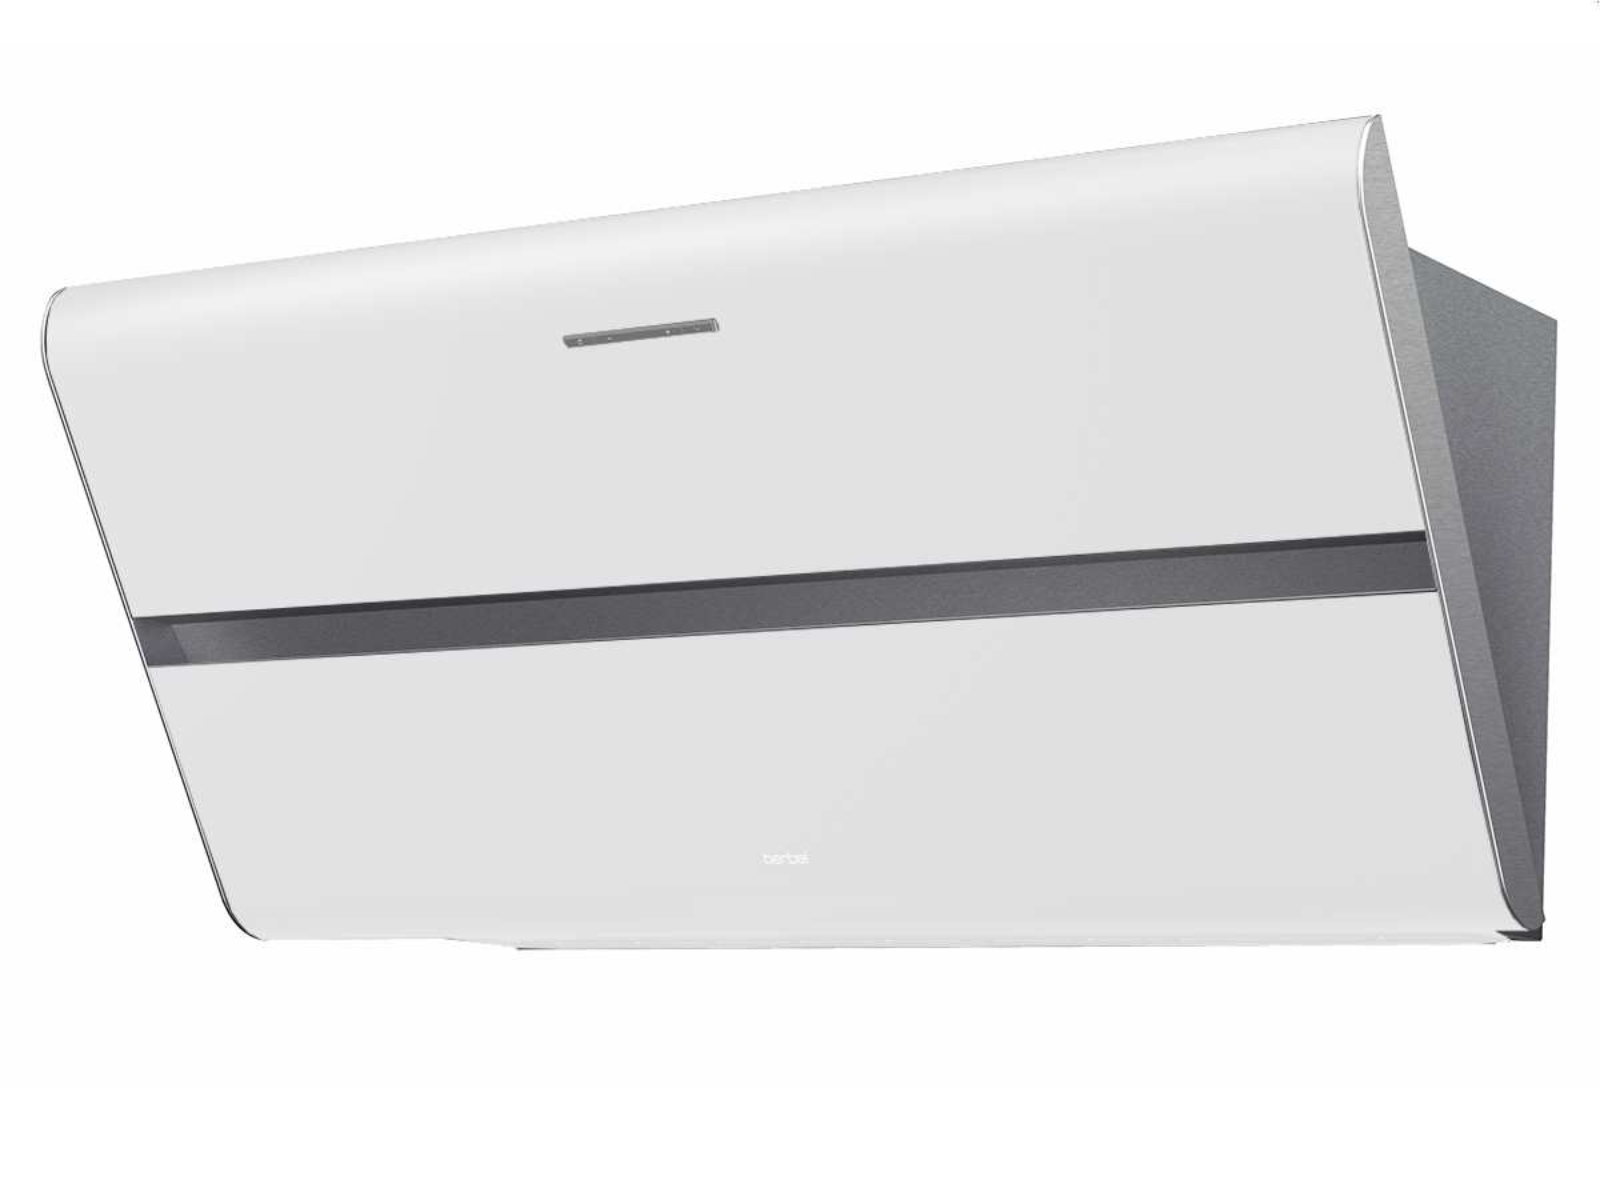 Produktabbildung Berbel Smartline BKH 90 ST W U Kopffreihaube Weiß